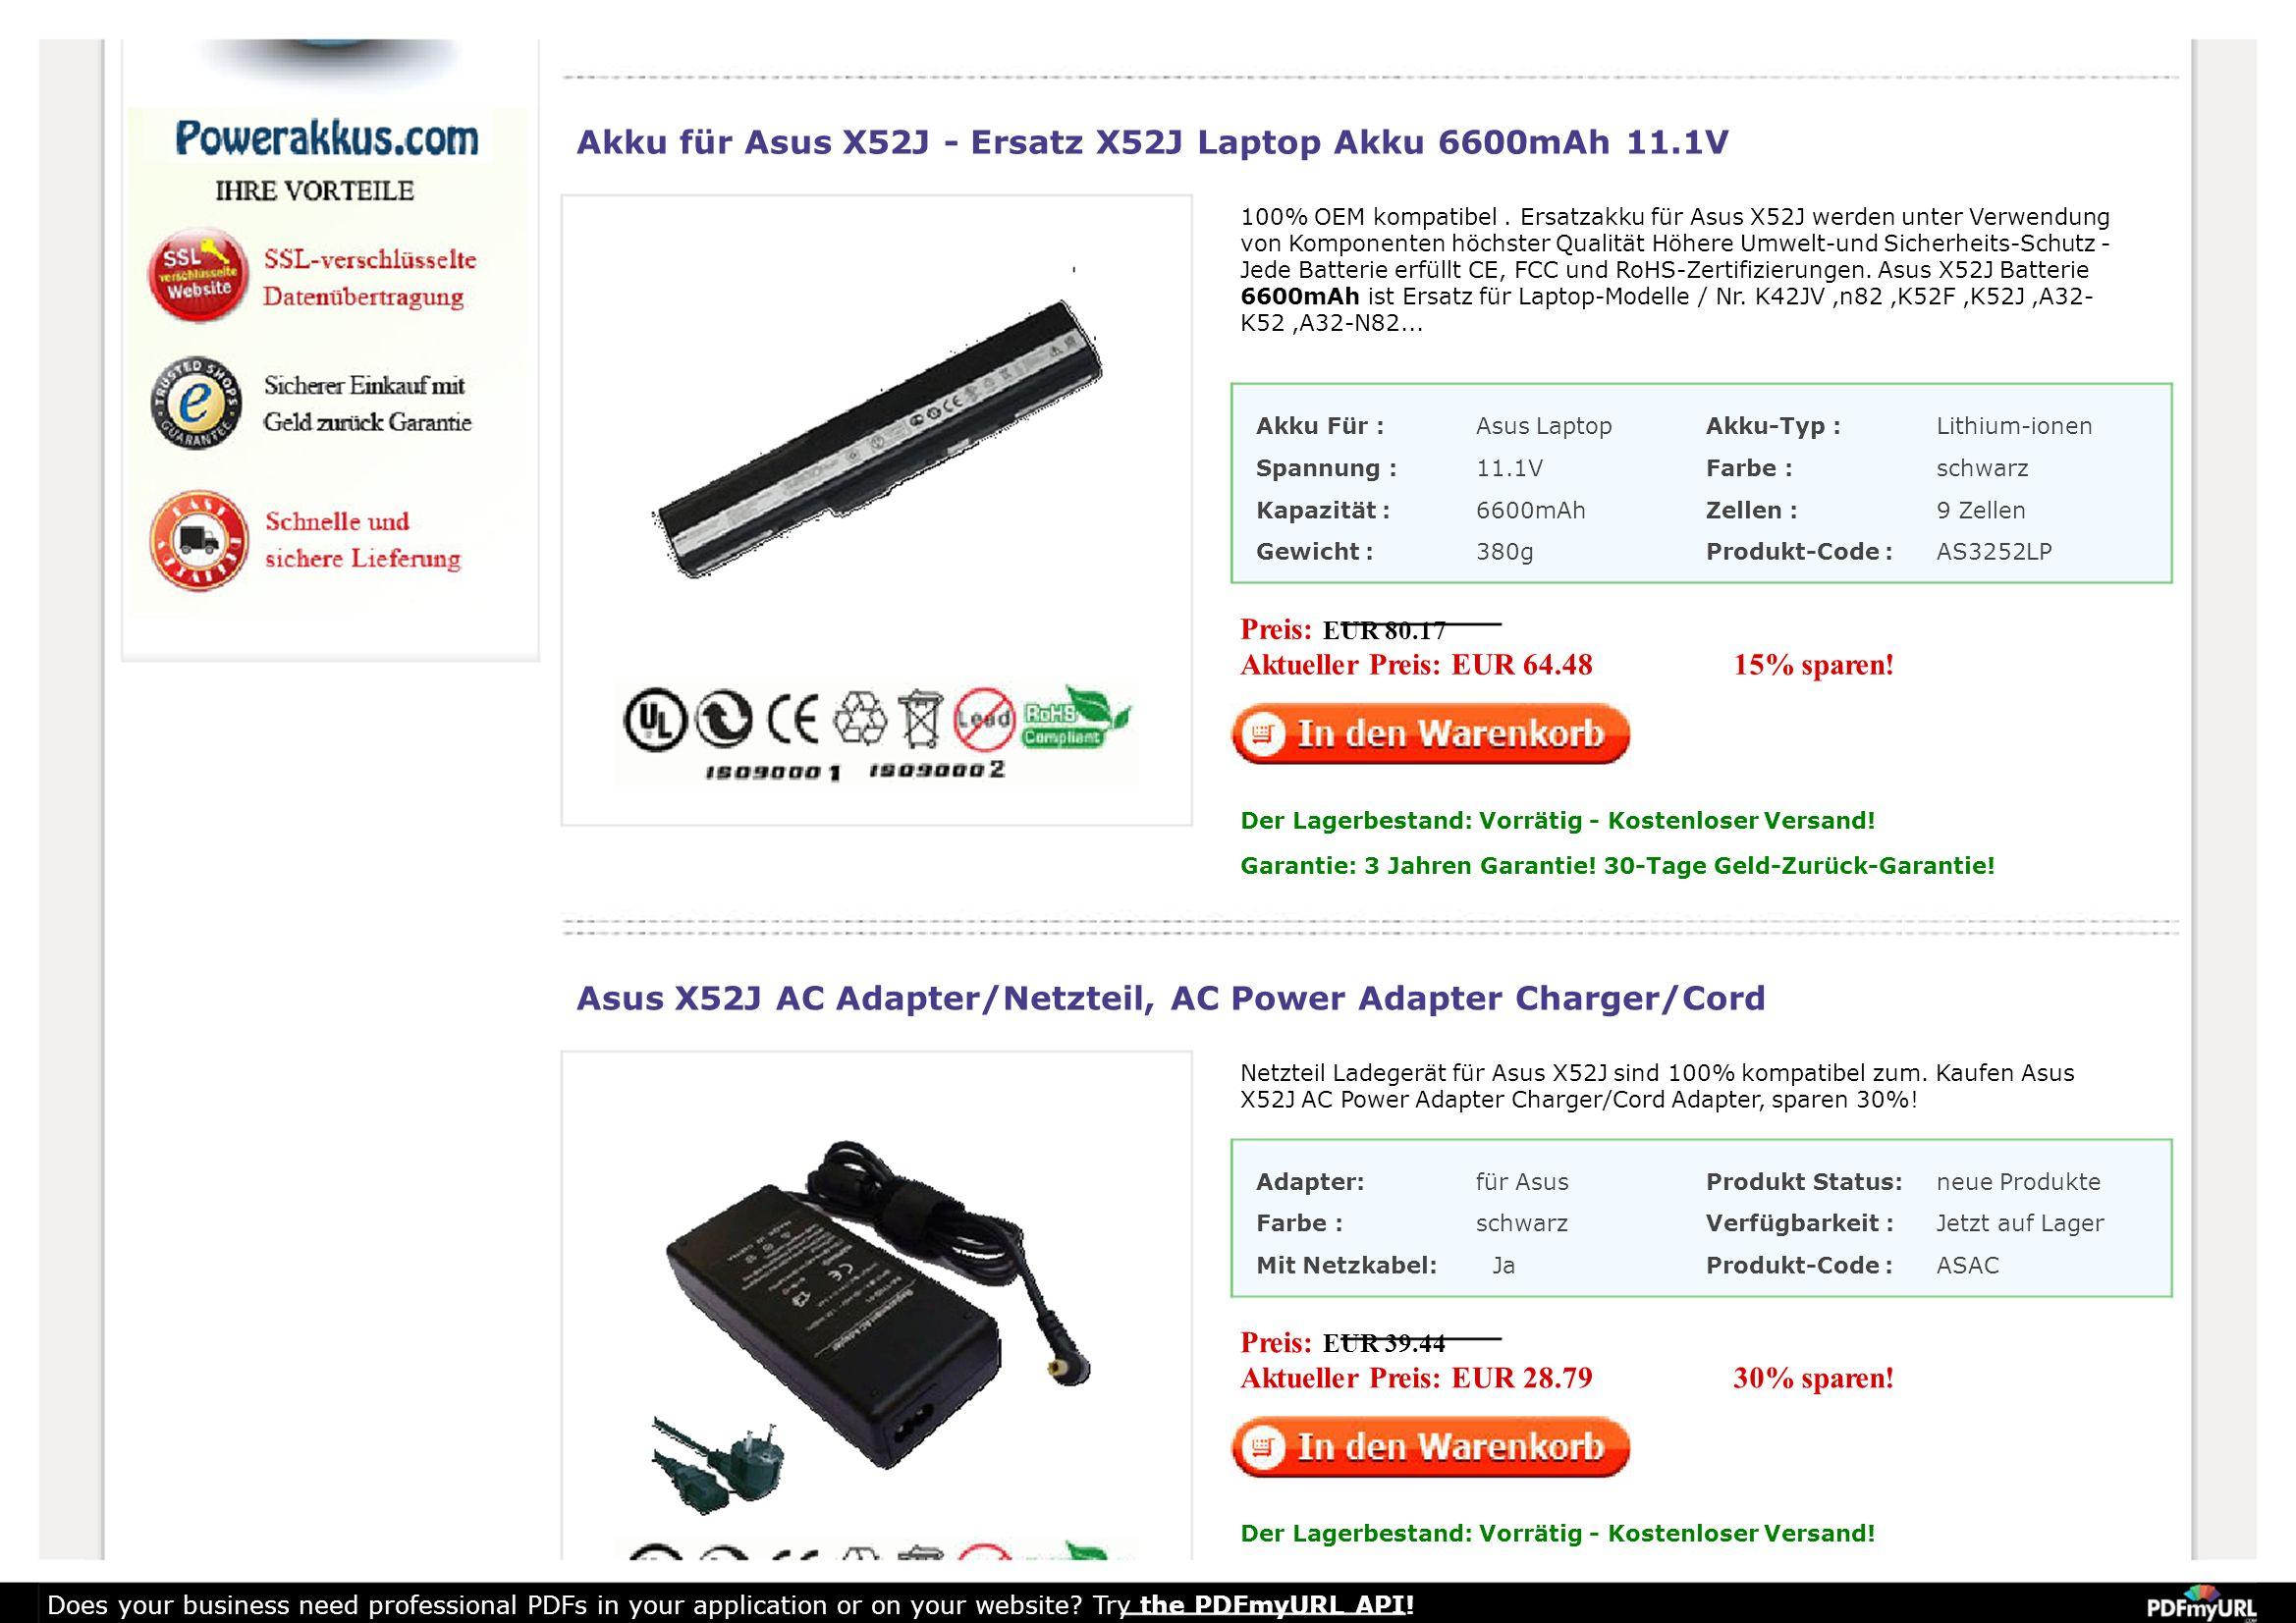 Akku für Asus X52J - Ersatz X52J Laptop Akku 6600mAh 11.1V 100% OEM kompatibel.